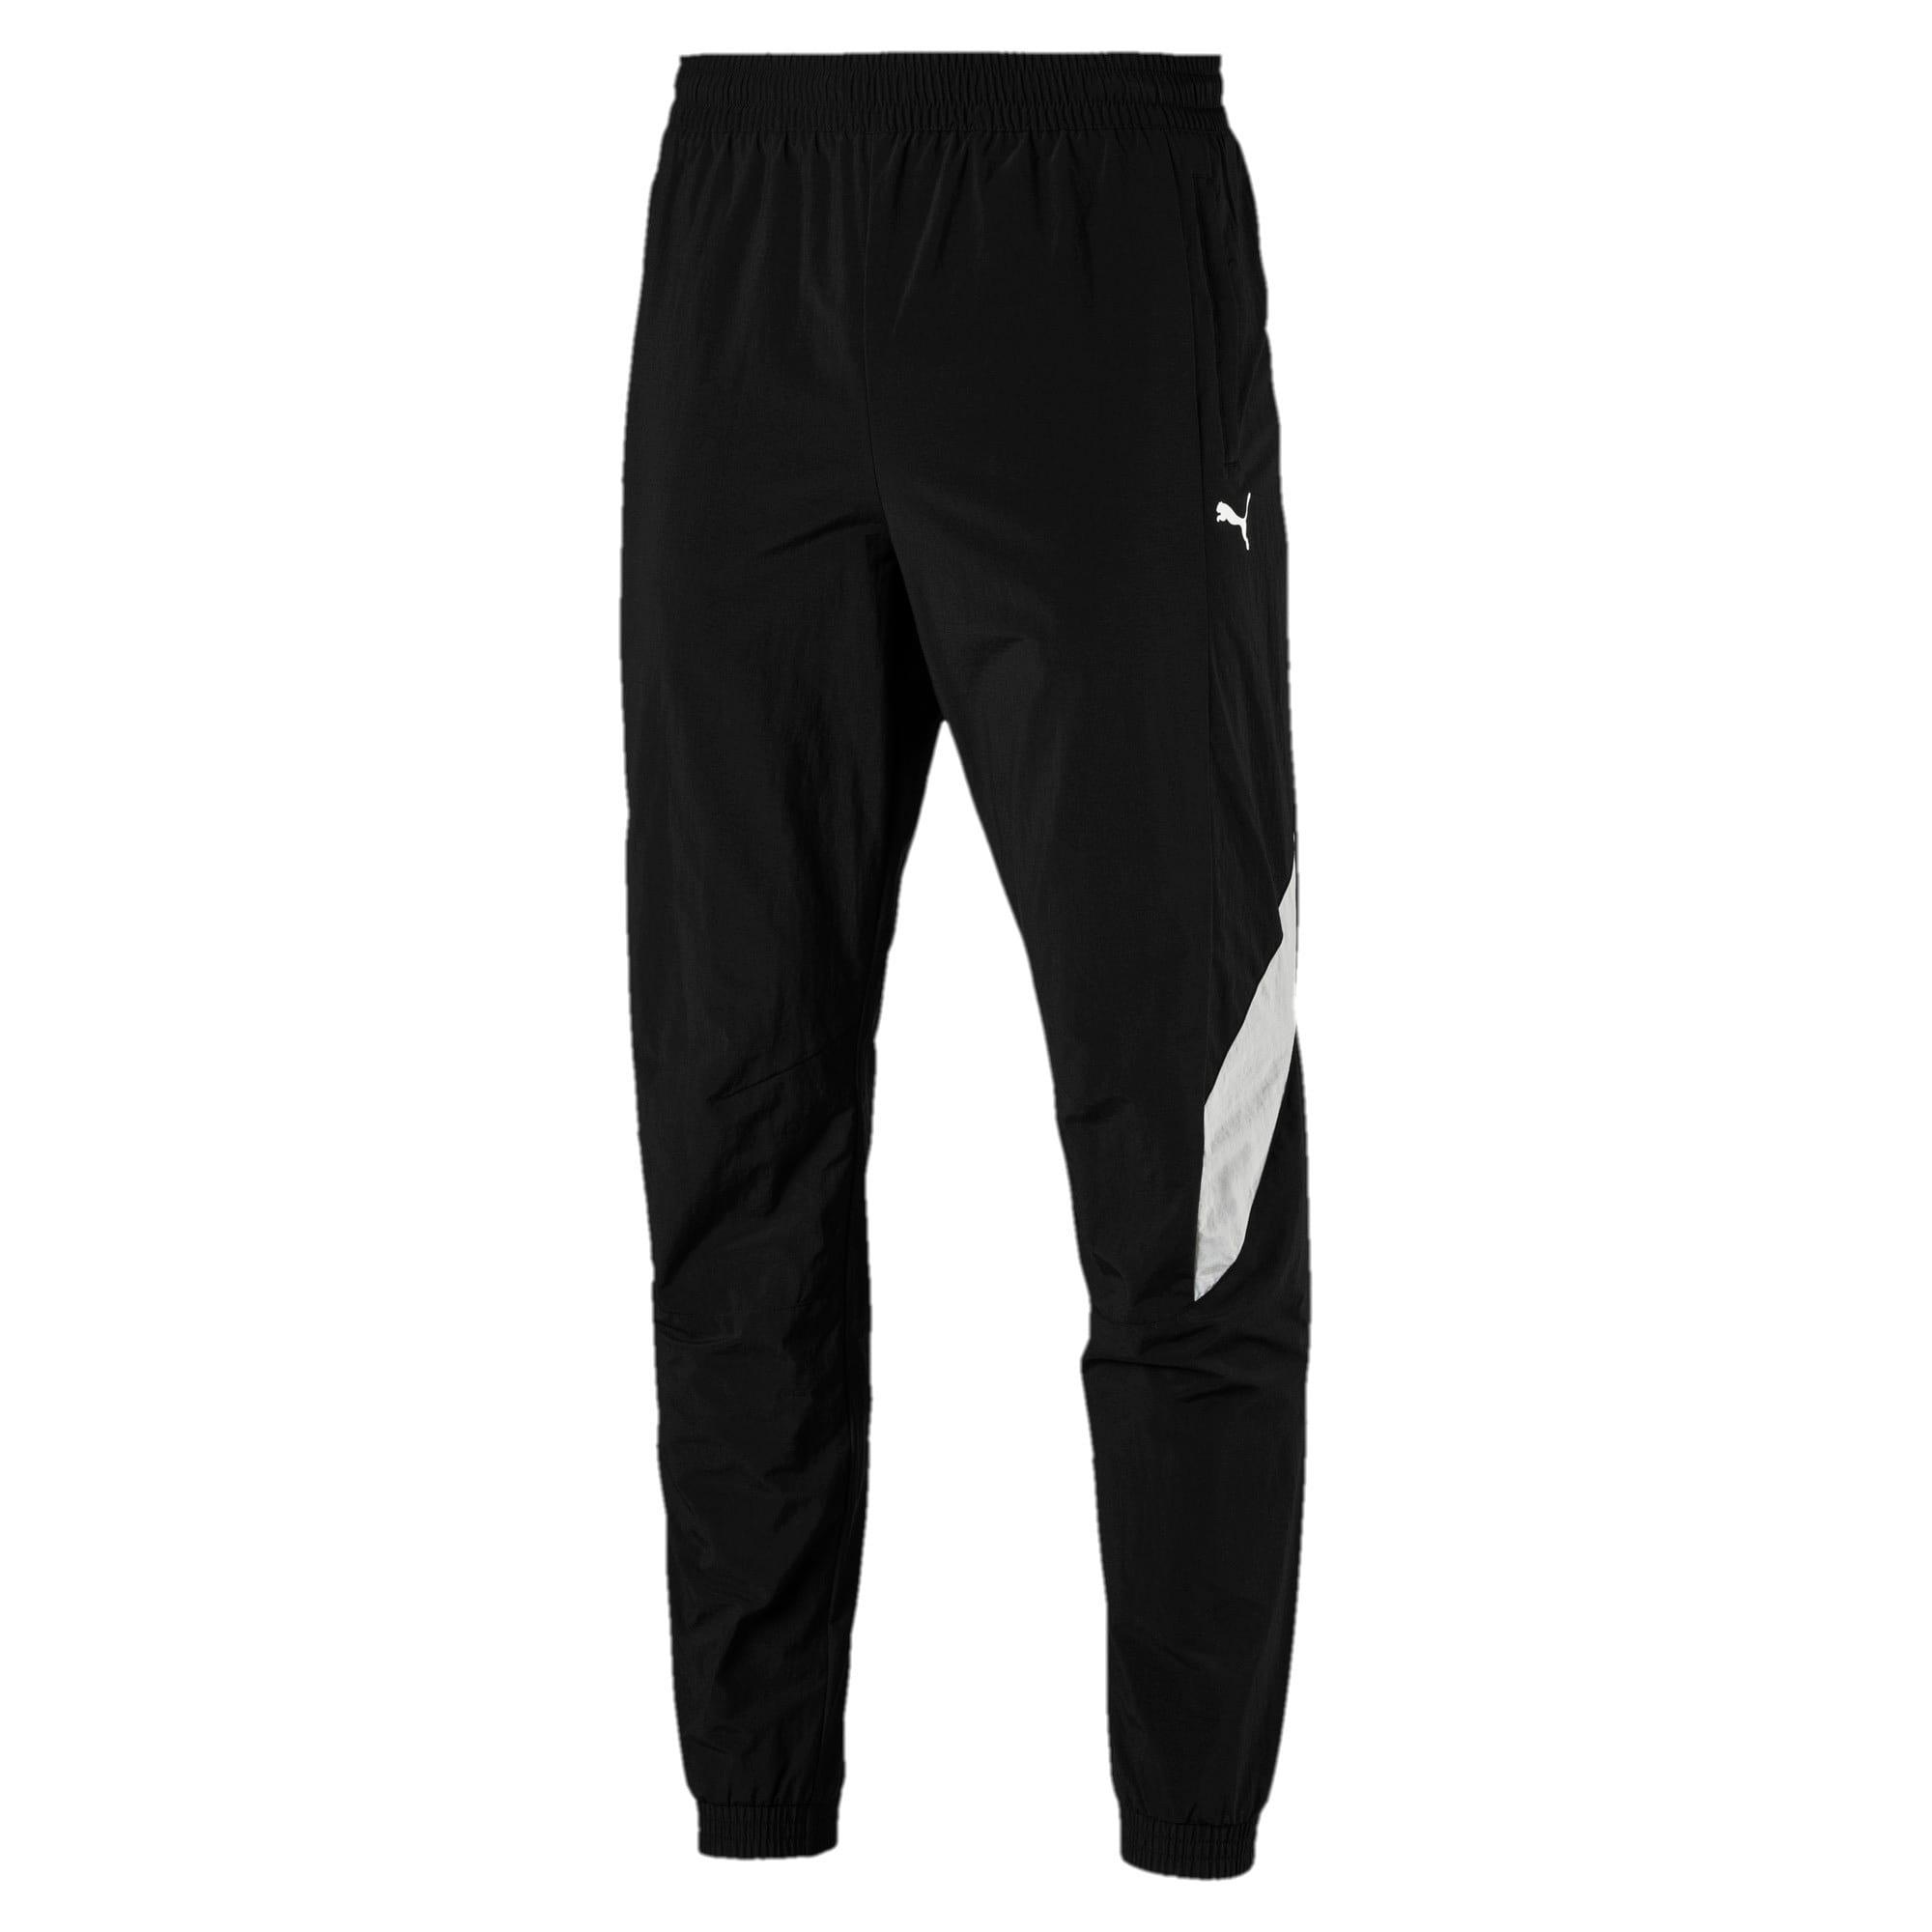 Thumbnail 1 of MERCEDES AMG PETRONAS Men's Woven Pants, Puma Black, medium